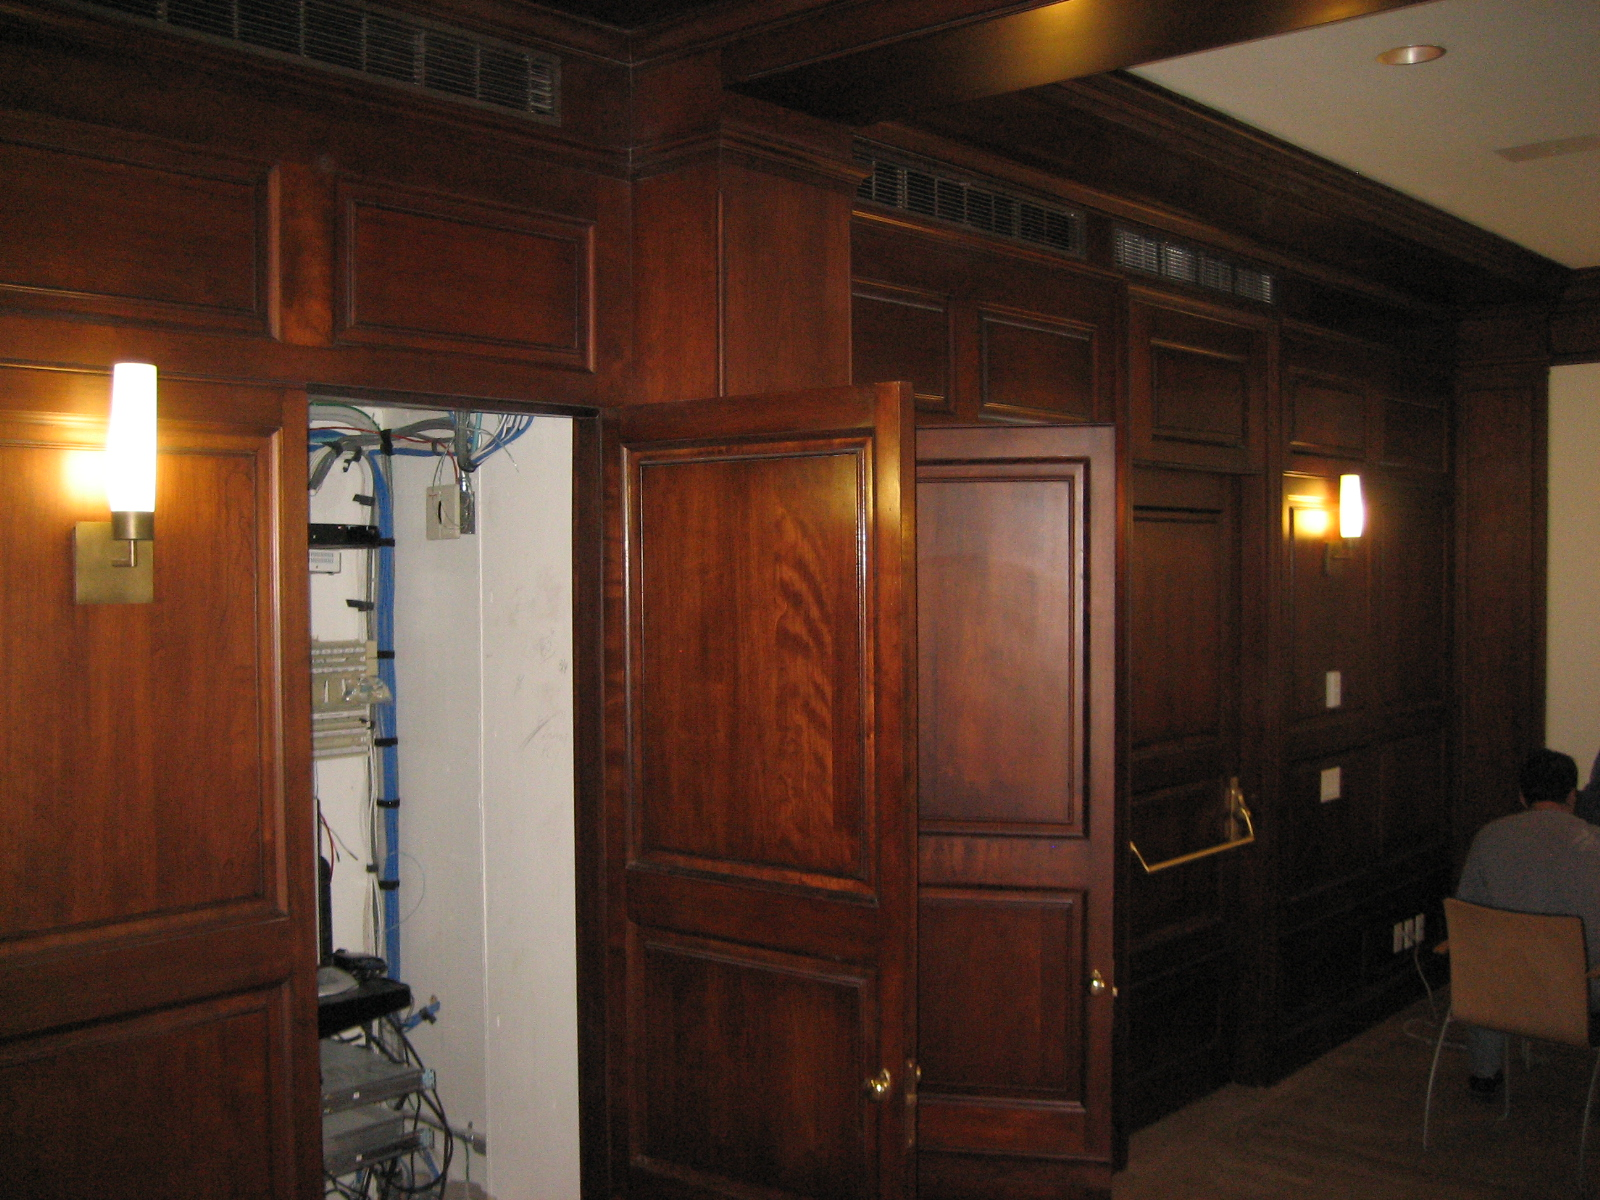 Custom Modern or Traditional Restaurant Millwork Kitchen Cabinets Restoration Woodwork with